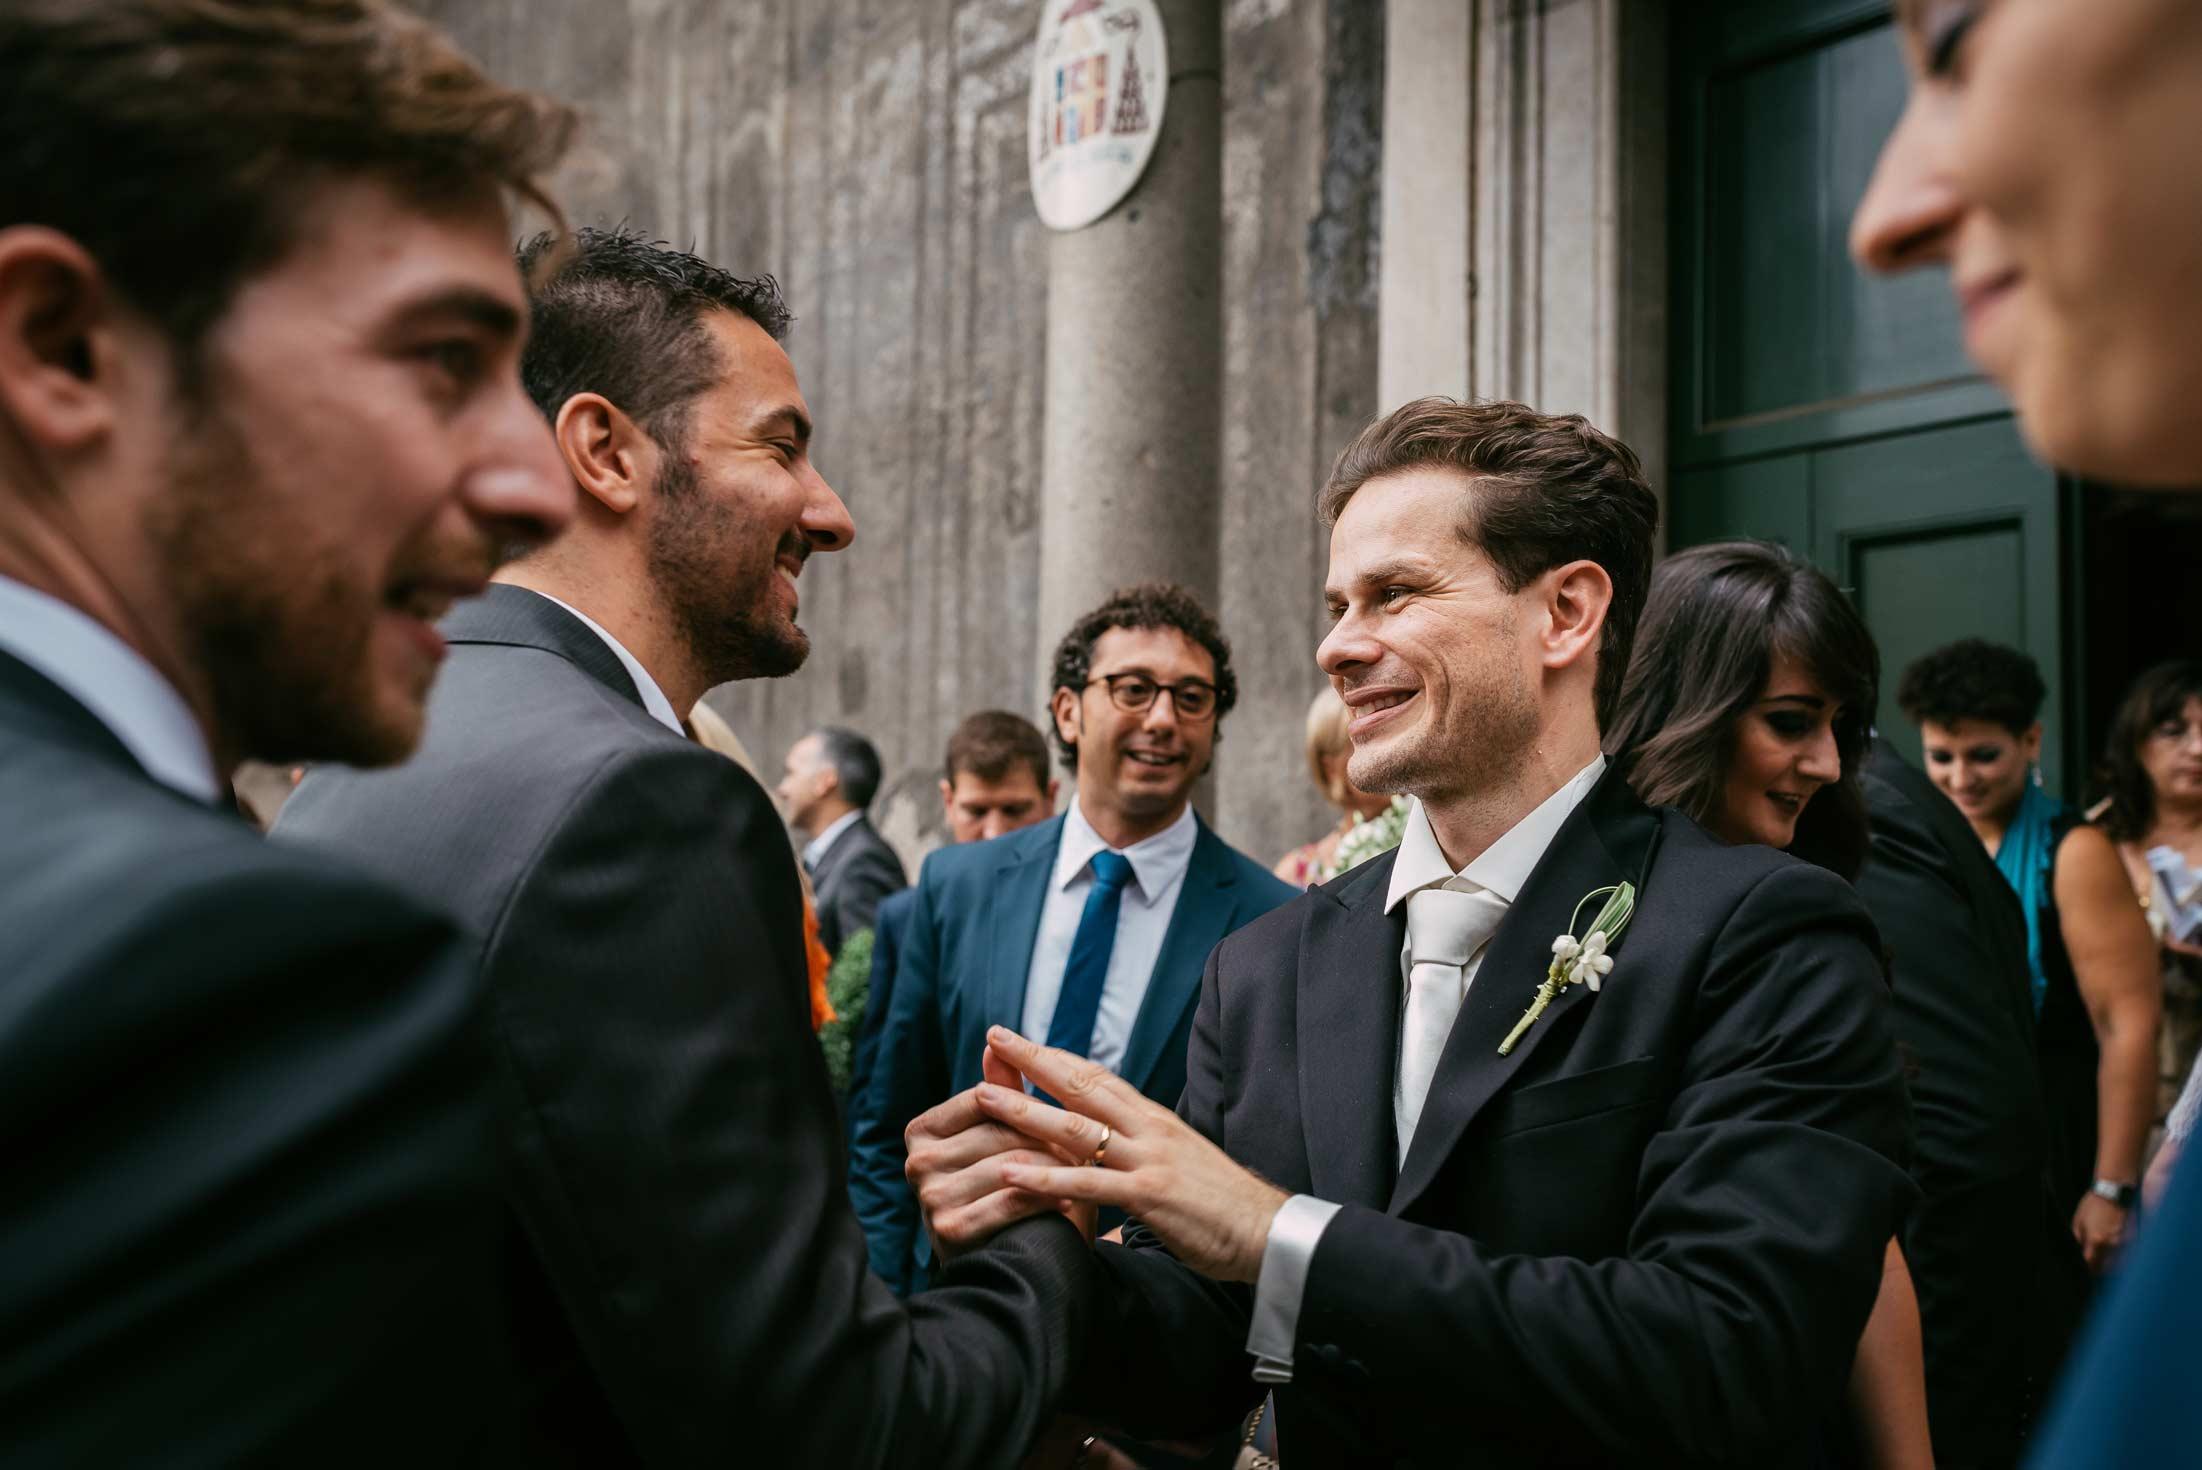 Reportage-Wedding-Photography-Documentary-Wedding-Photography-1-Ceremony